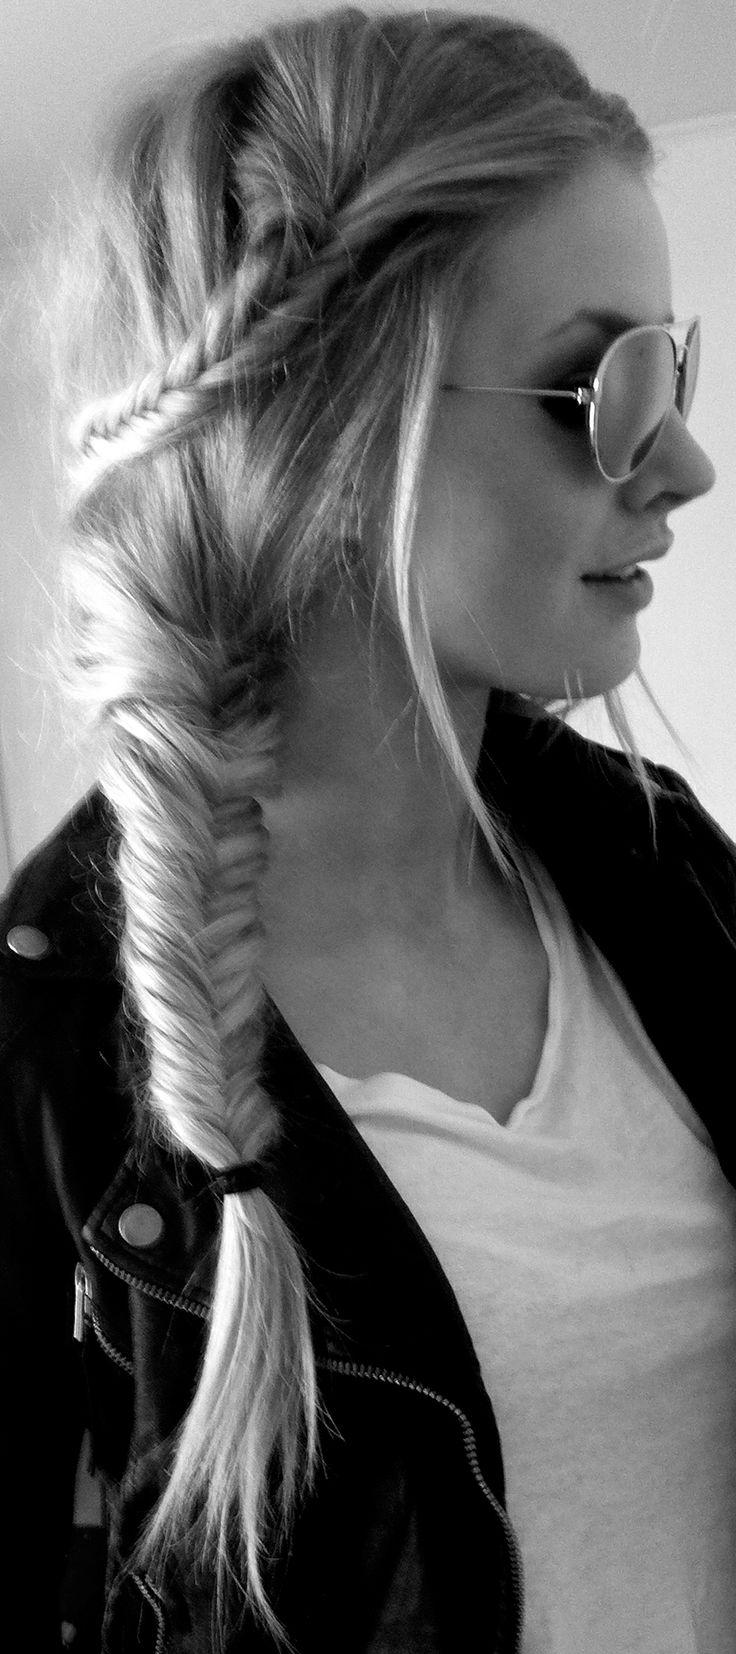 love this braid!Fish Tail, Mom Style, Long Hair, Longhair, Double Braids, Fishtail Braids, Hair Style, Side Braids, Braids Hair